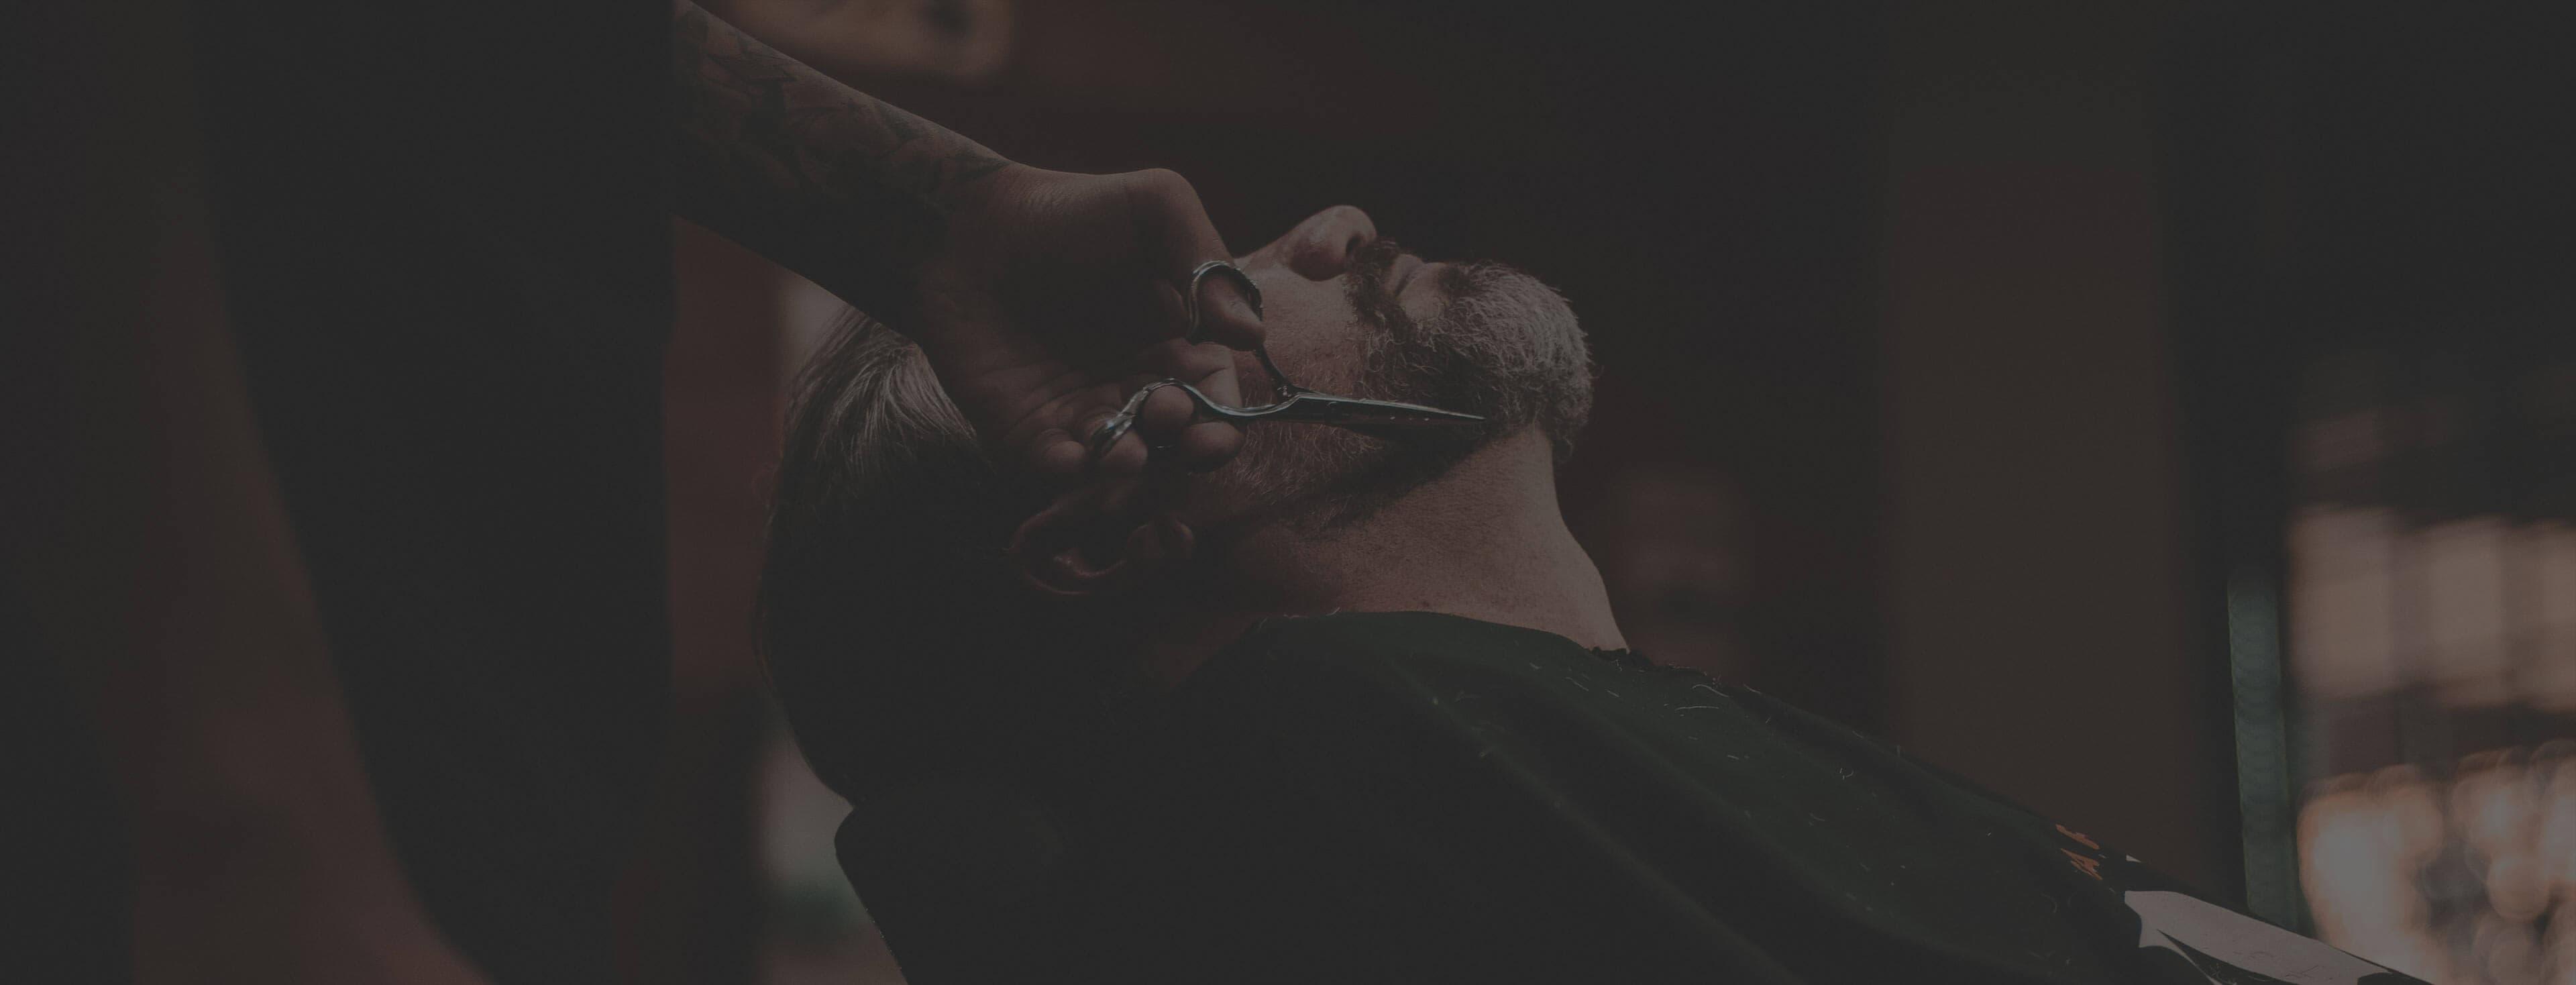 Athens Gentlemen Barbershop Homepage Hero Image